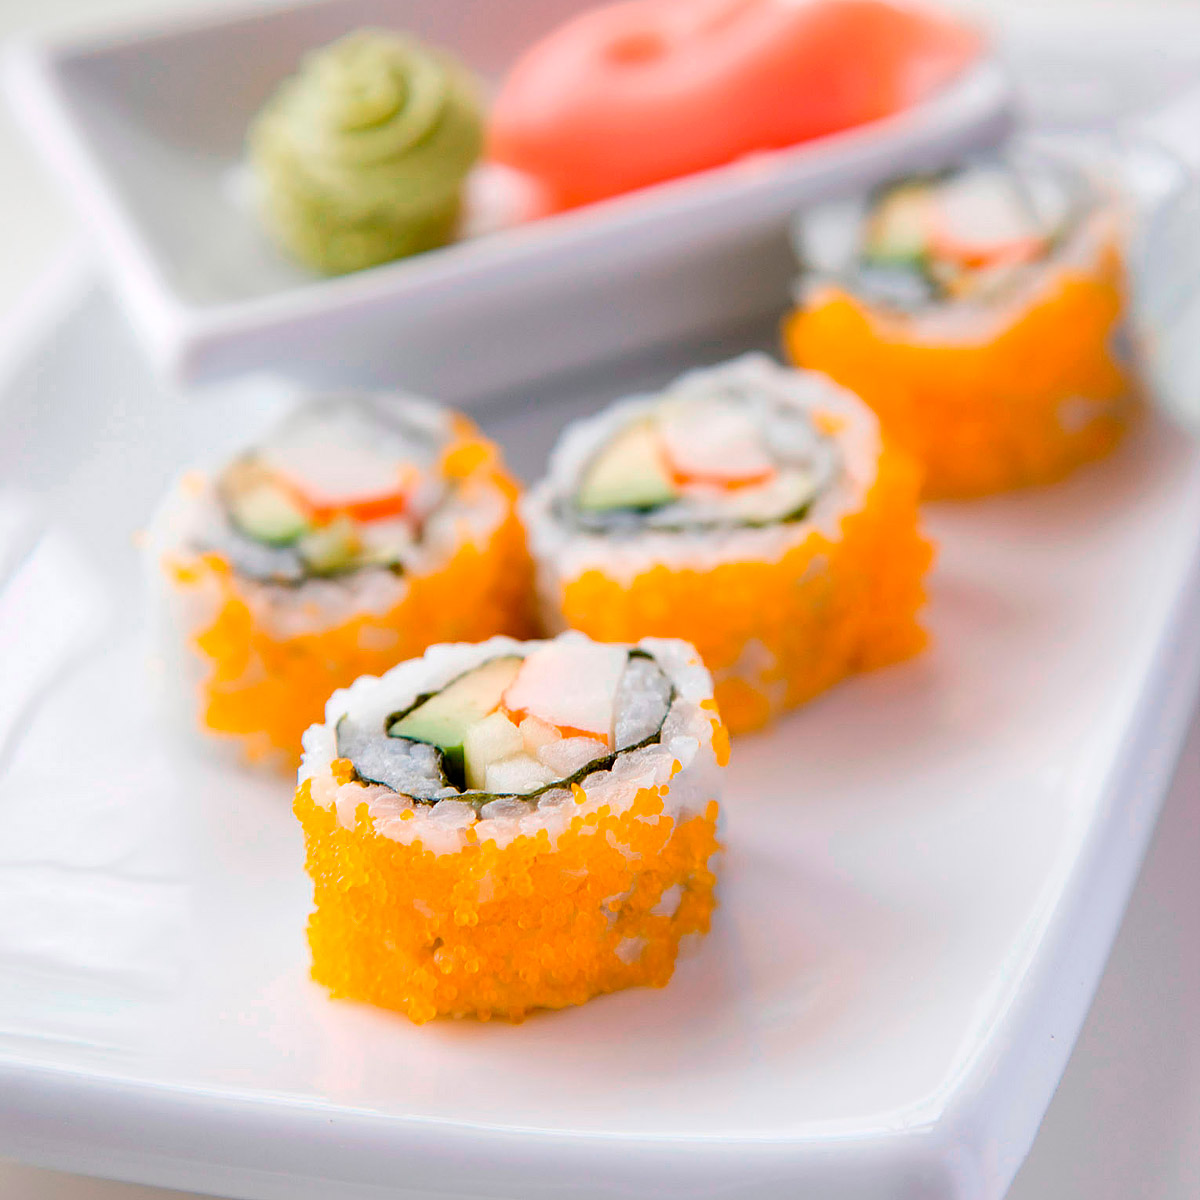 Curso de sushi para principiantes escuela de cocina telva for Cocina para principiantes